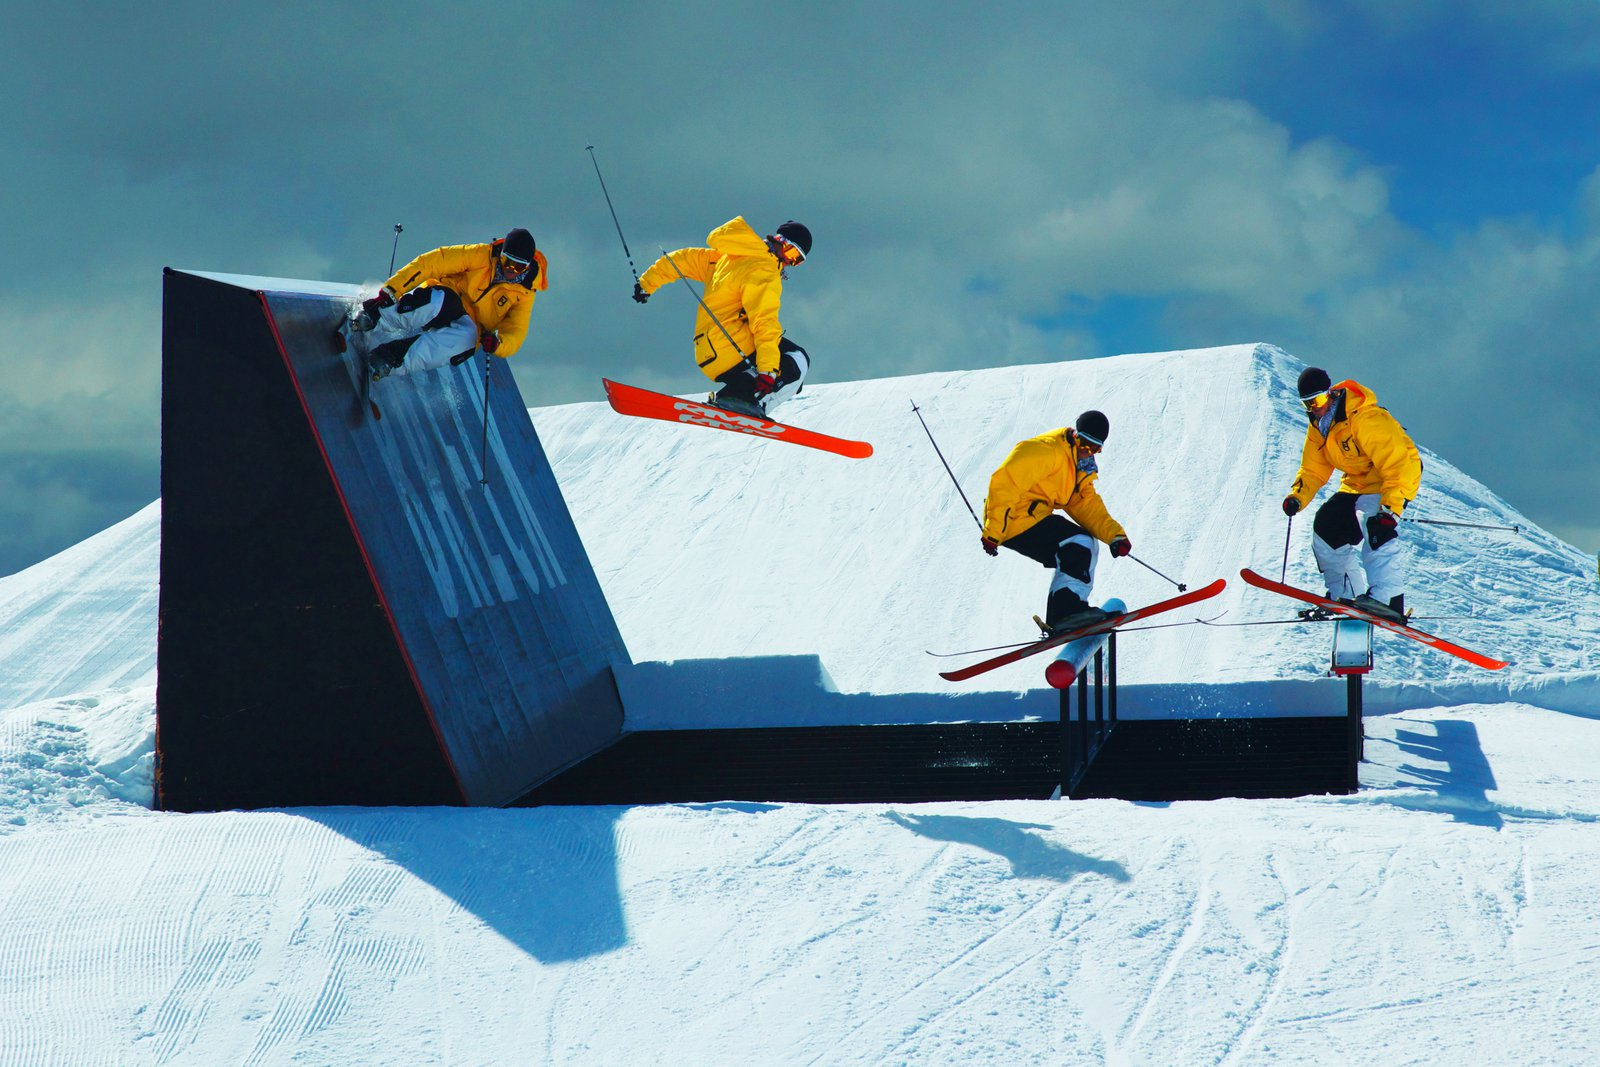 Graham Owen - Breck Stair Set Sequence